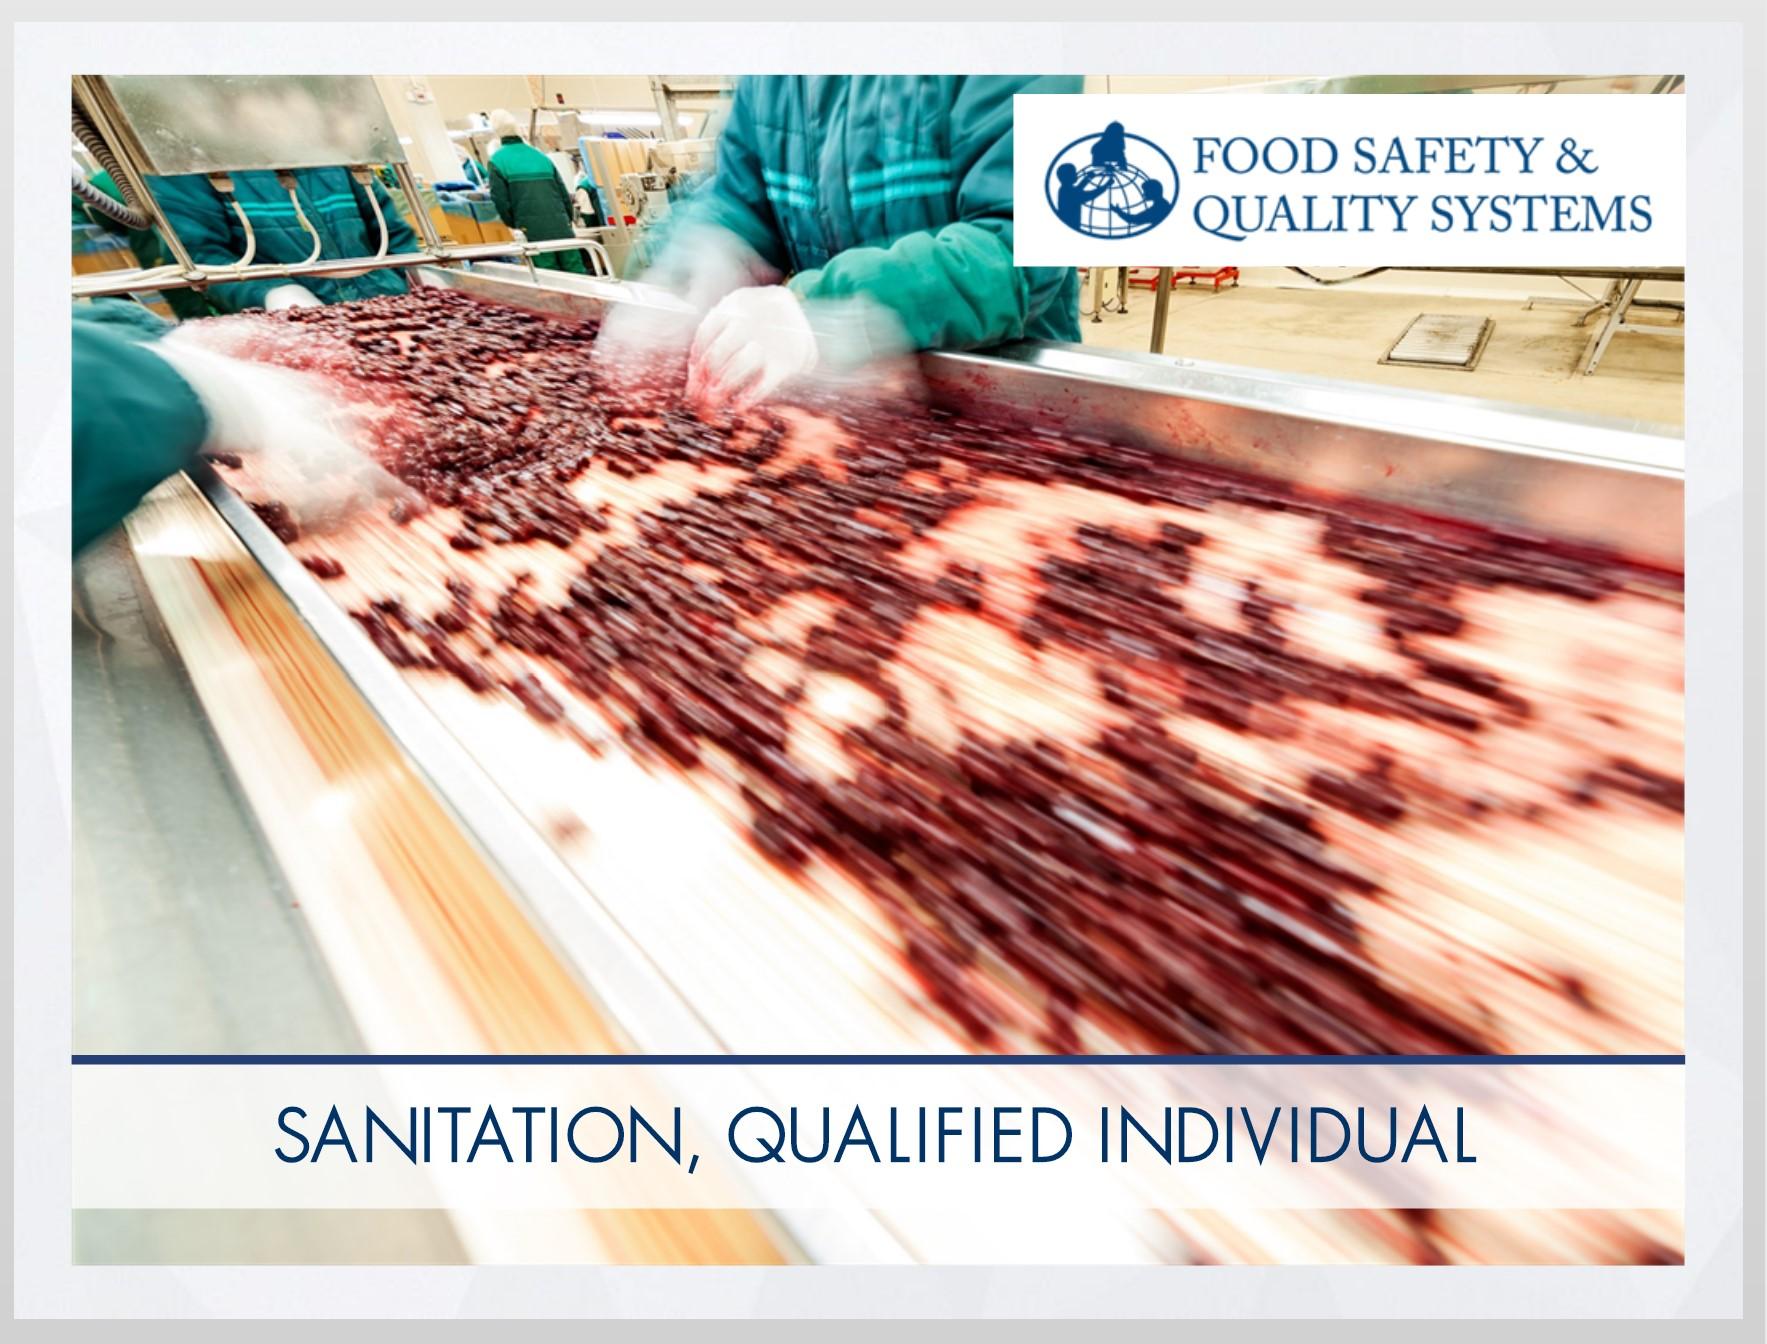 Sanitation Qualified Individual